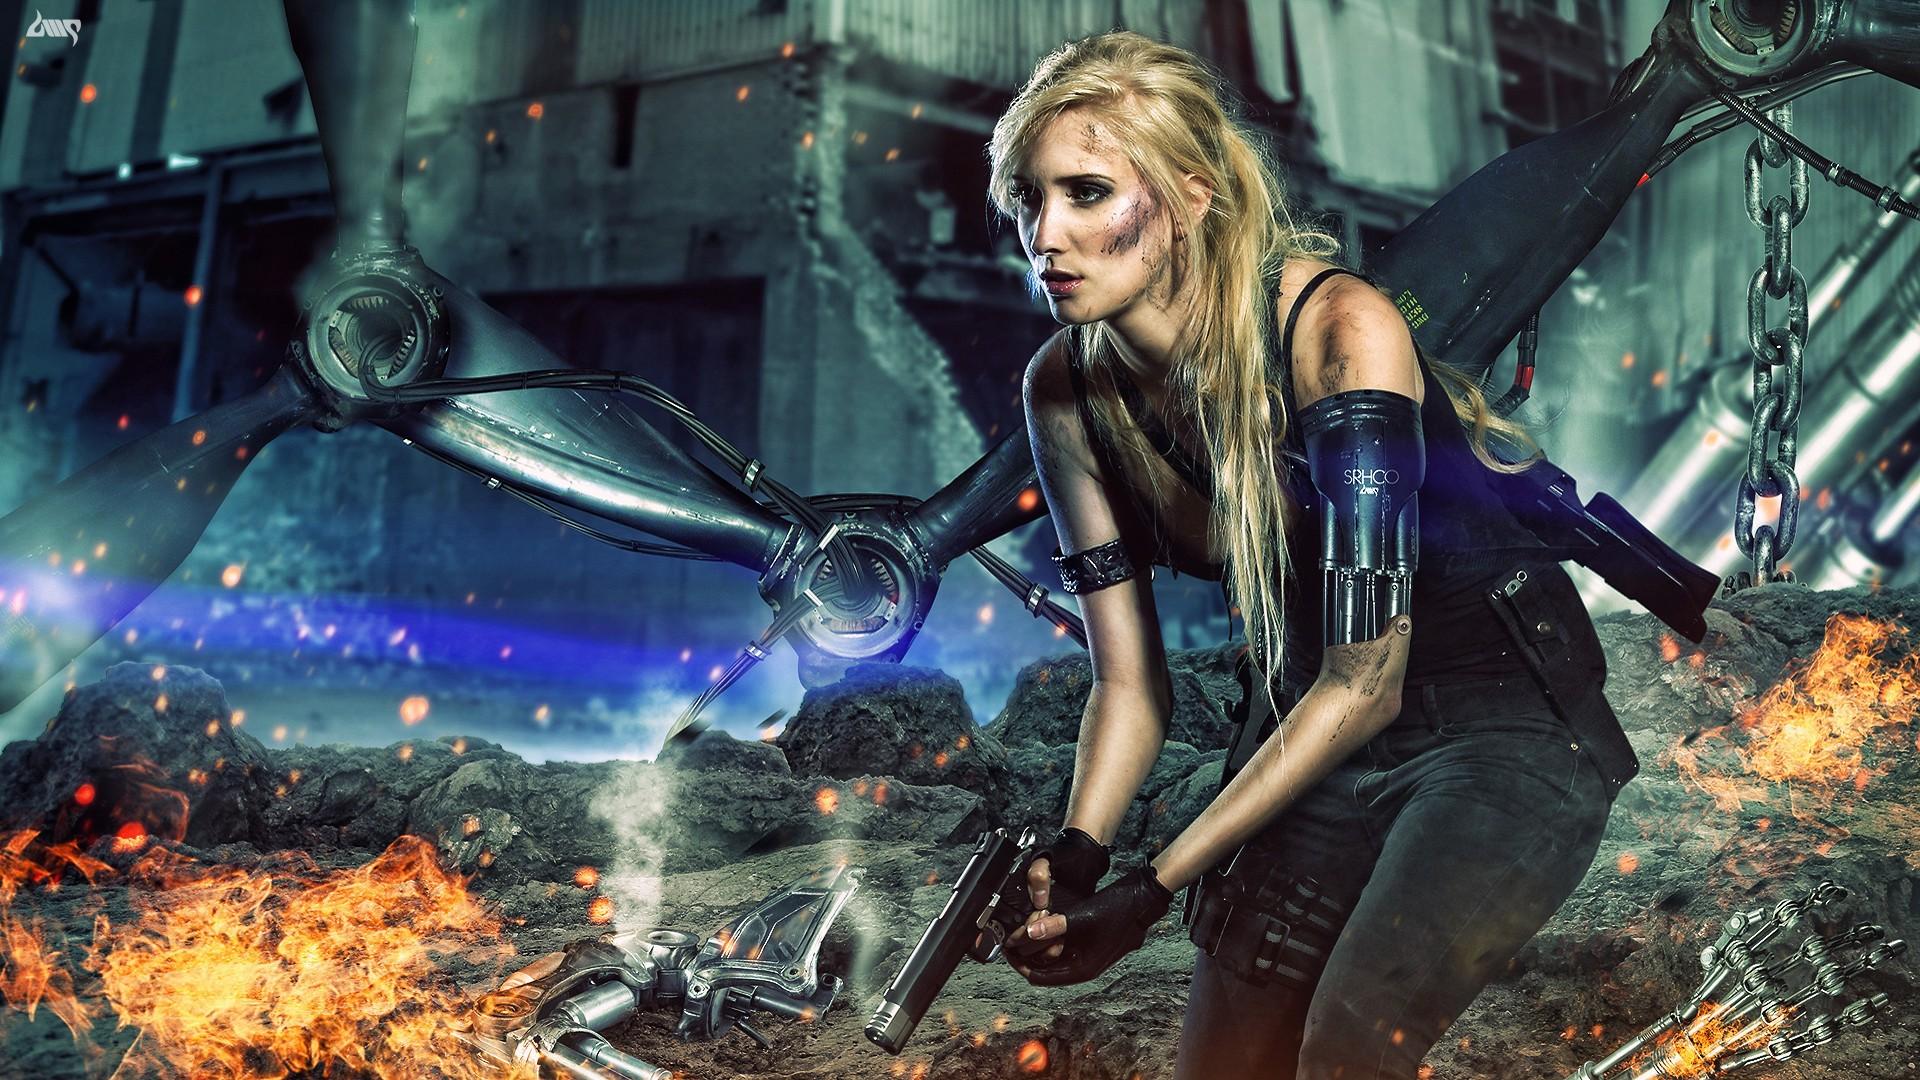 Women Warrior Artwork Sword Rain Cyberpunk Cyberpunk: Papel De Parede : Arma De Fogo, Mulheres, Loiras